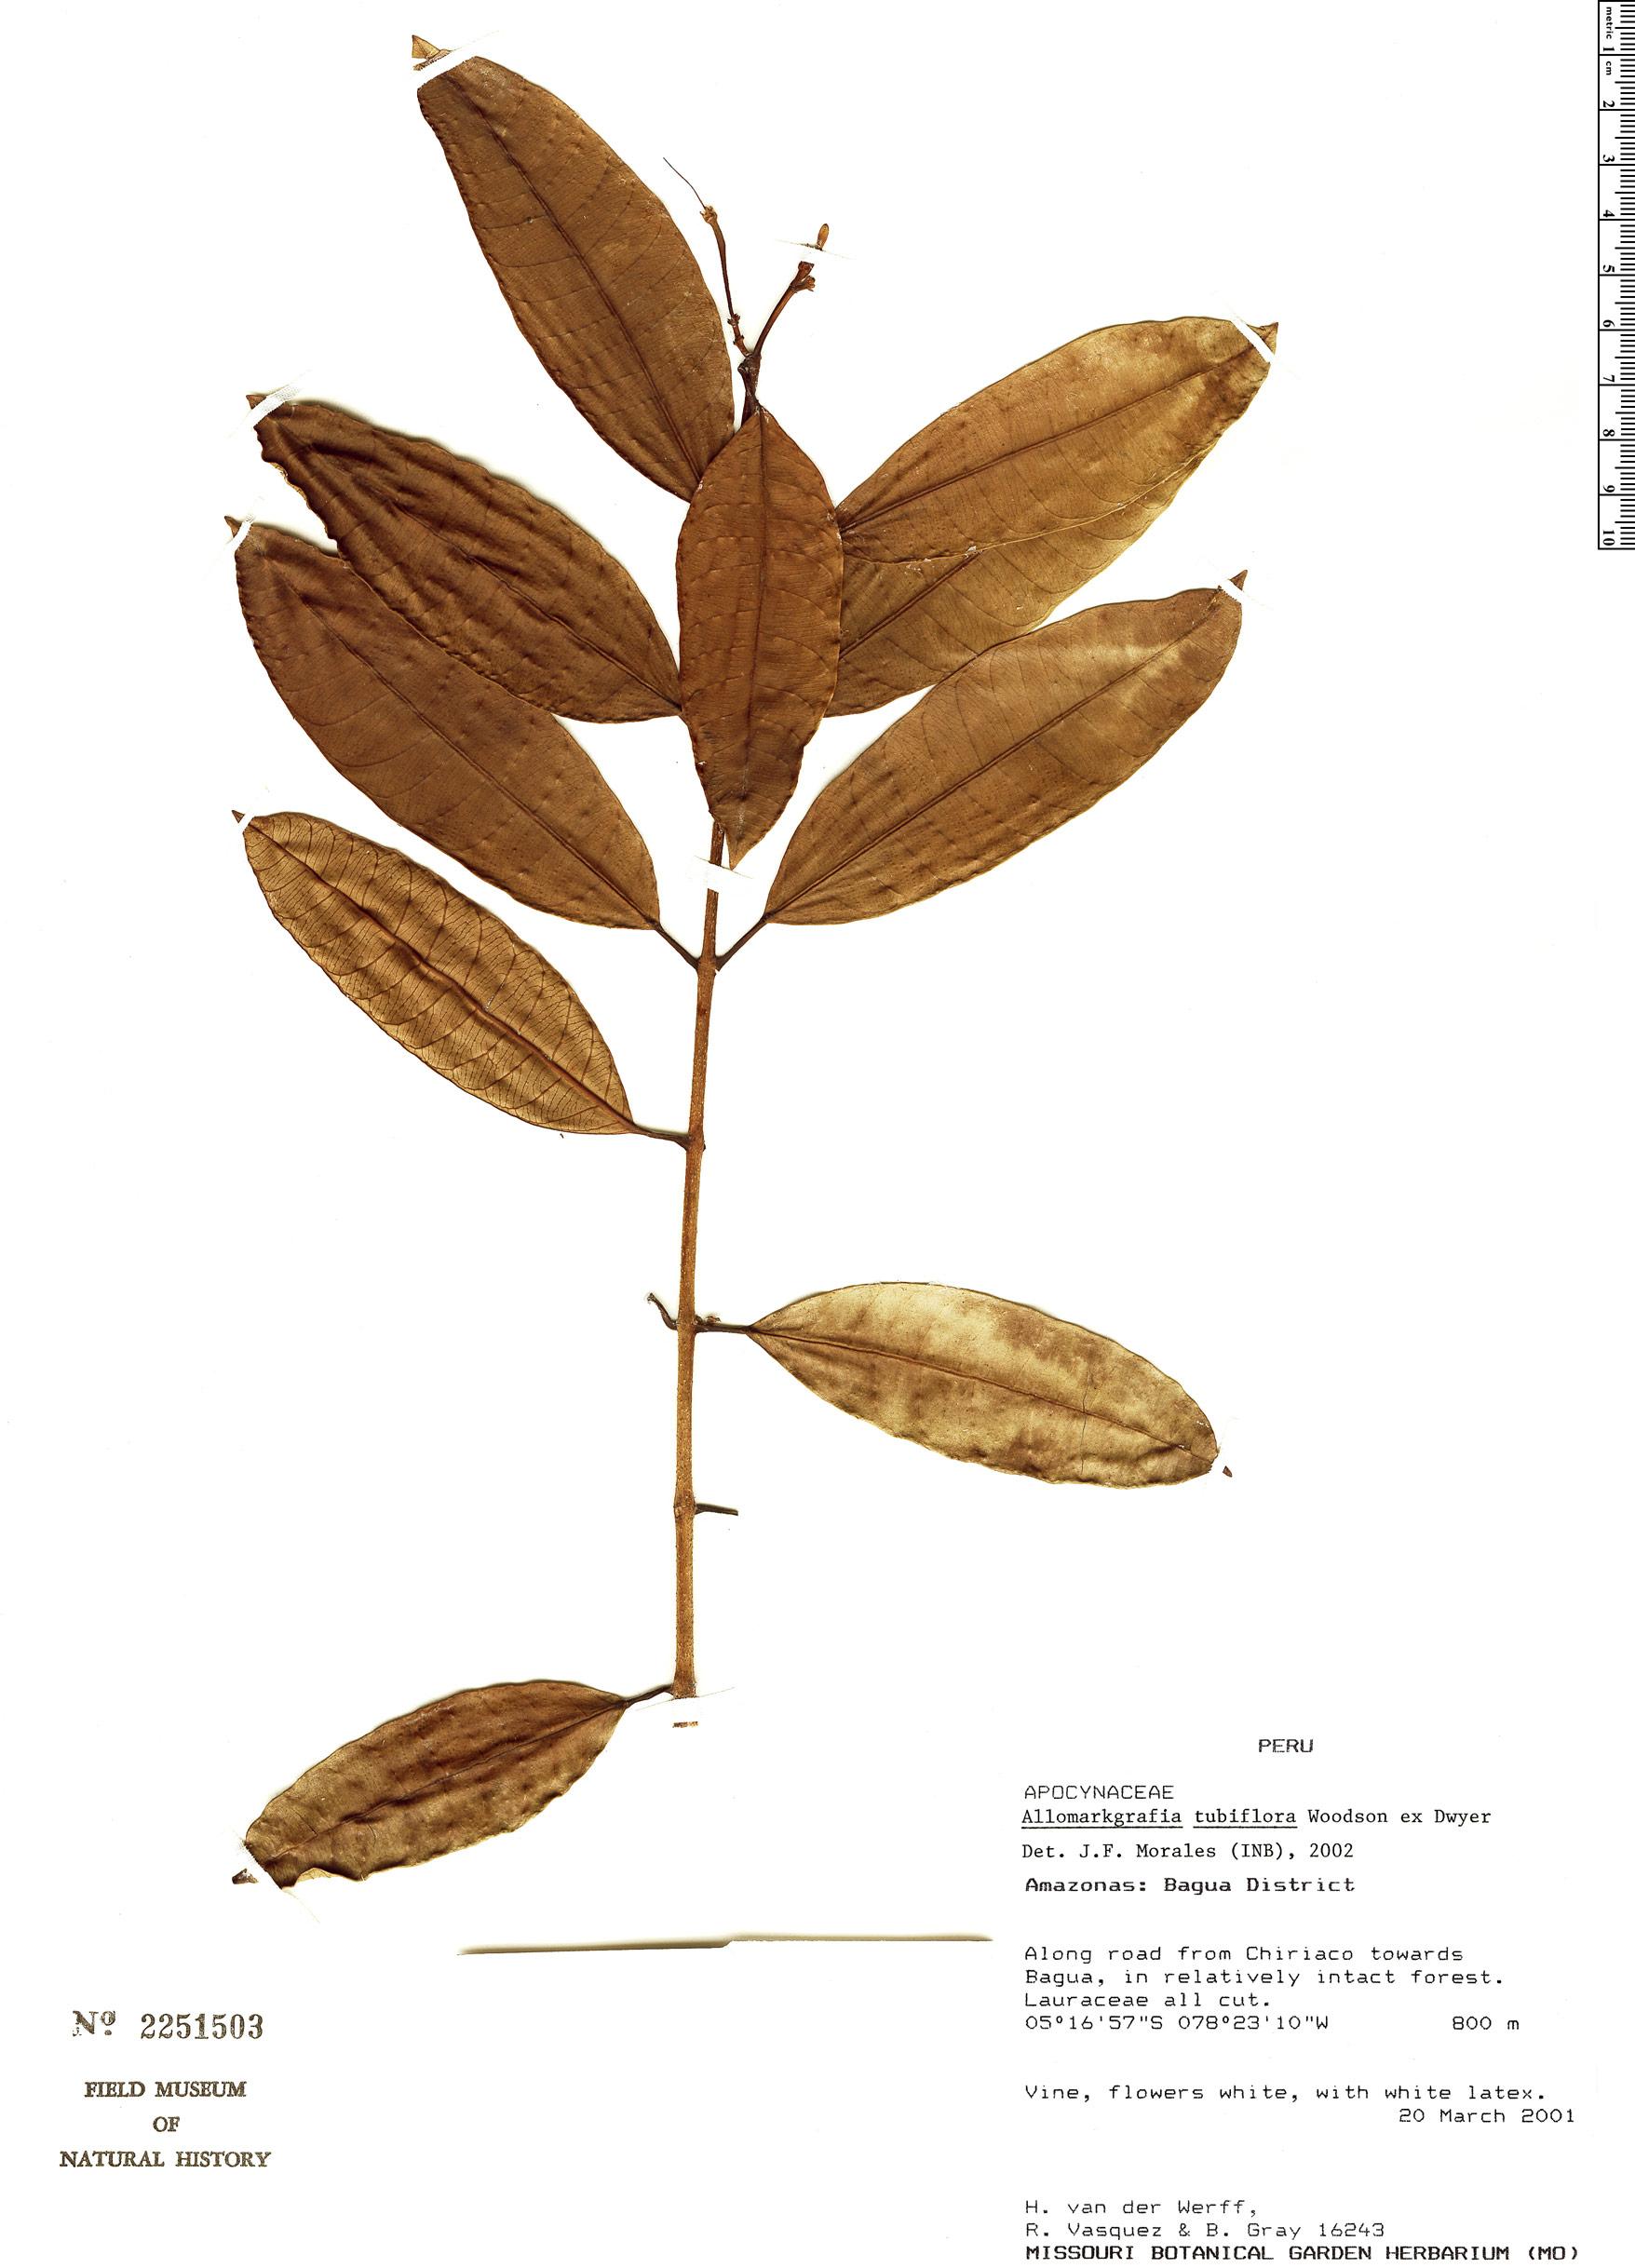 Specimen: Allomarkgrafia tubiflora